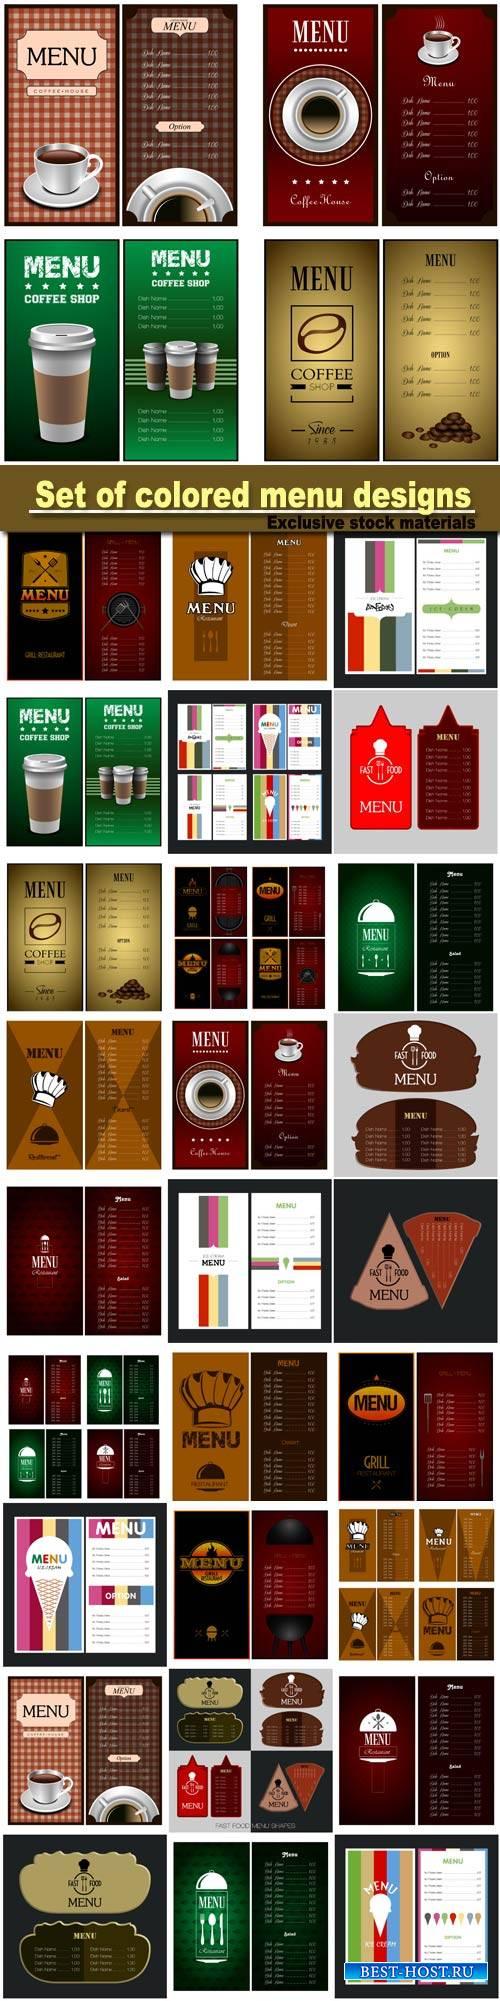 Set of colored menu designs, vector illustration